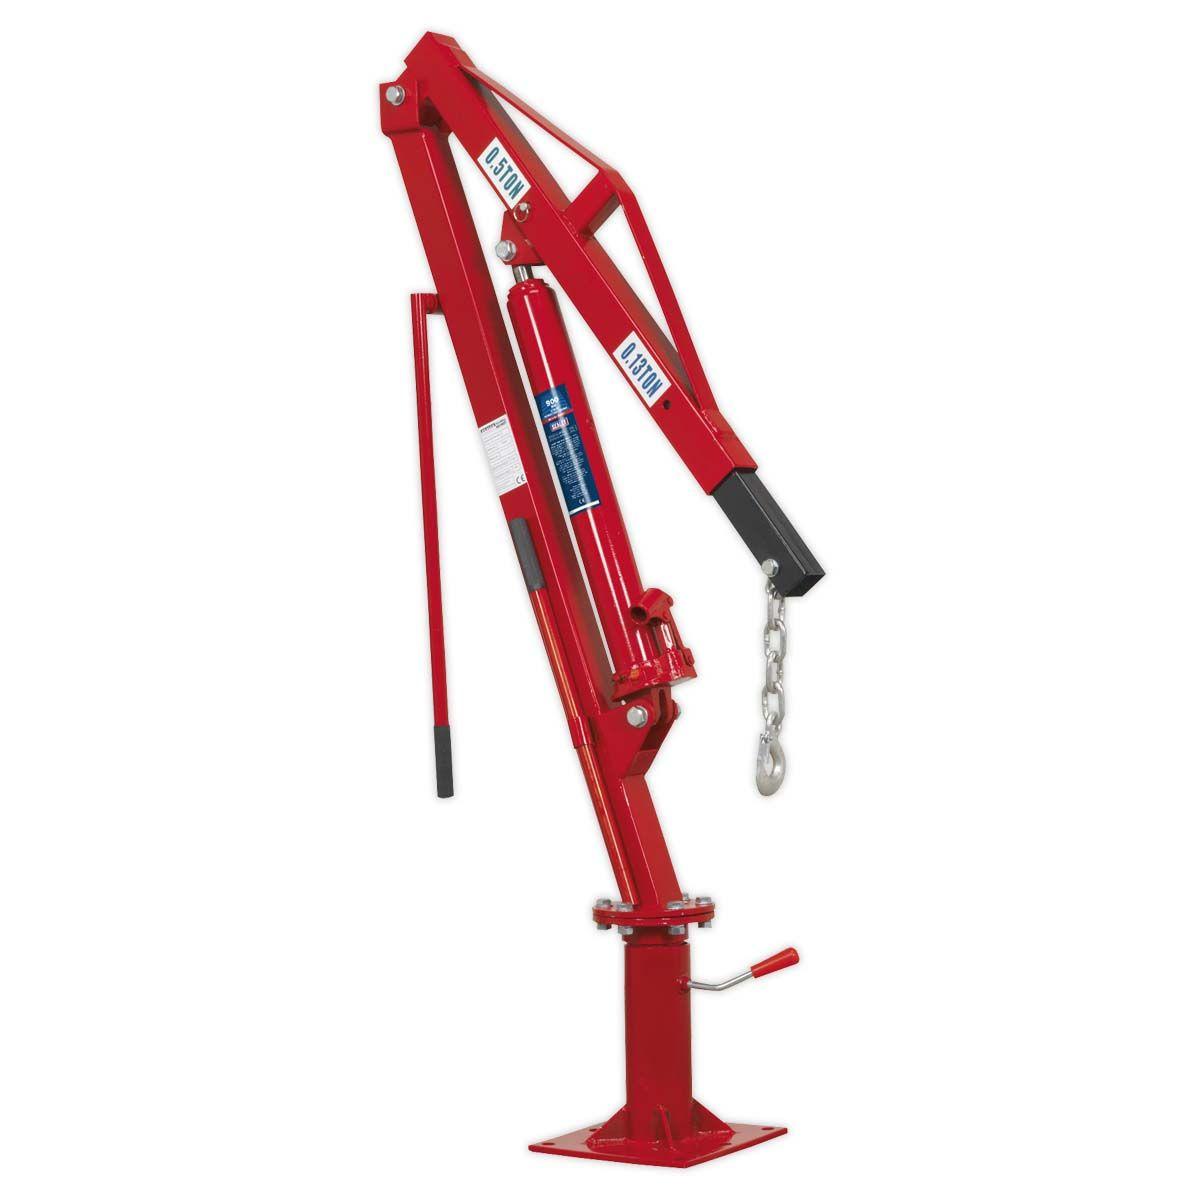 Sealey Static Mounted Crane 900kg